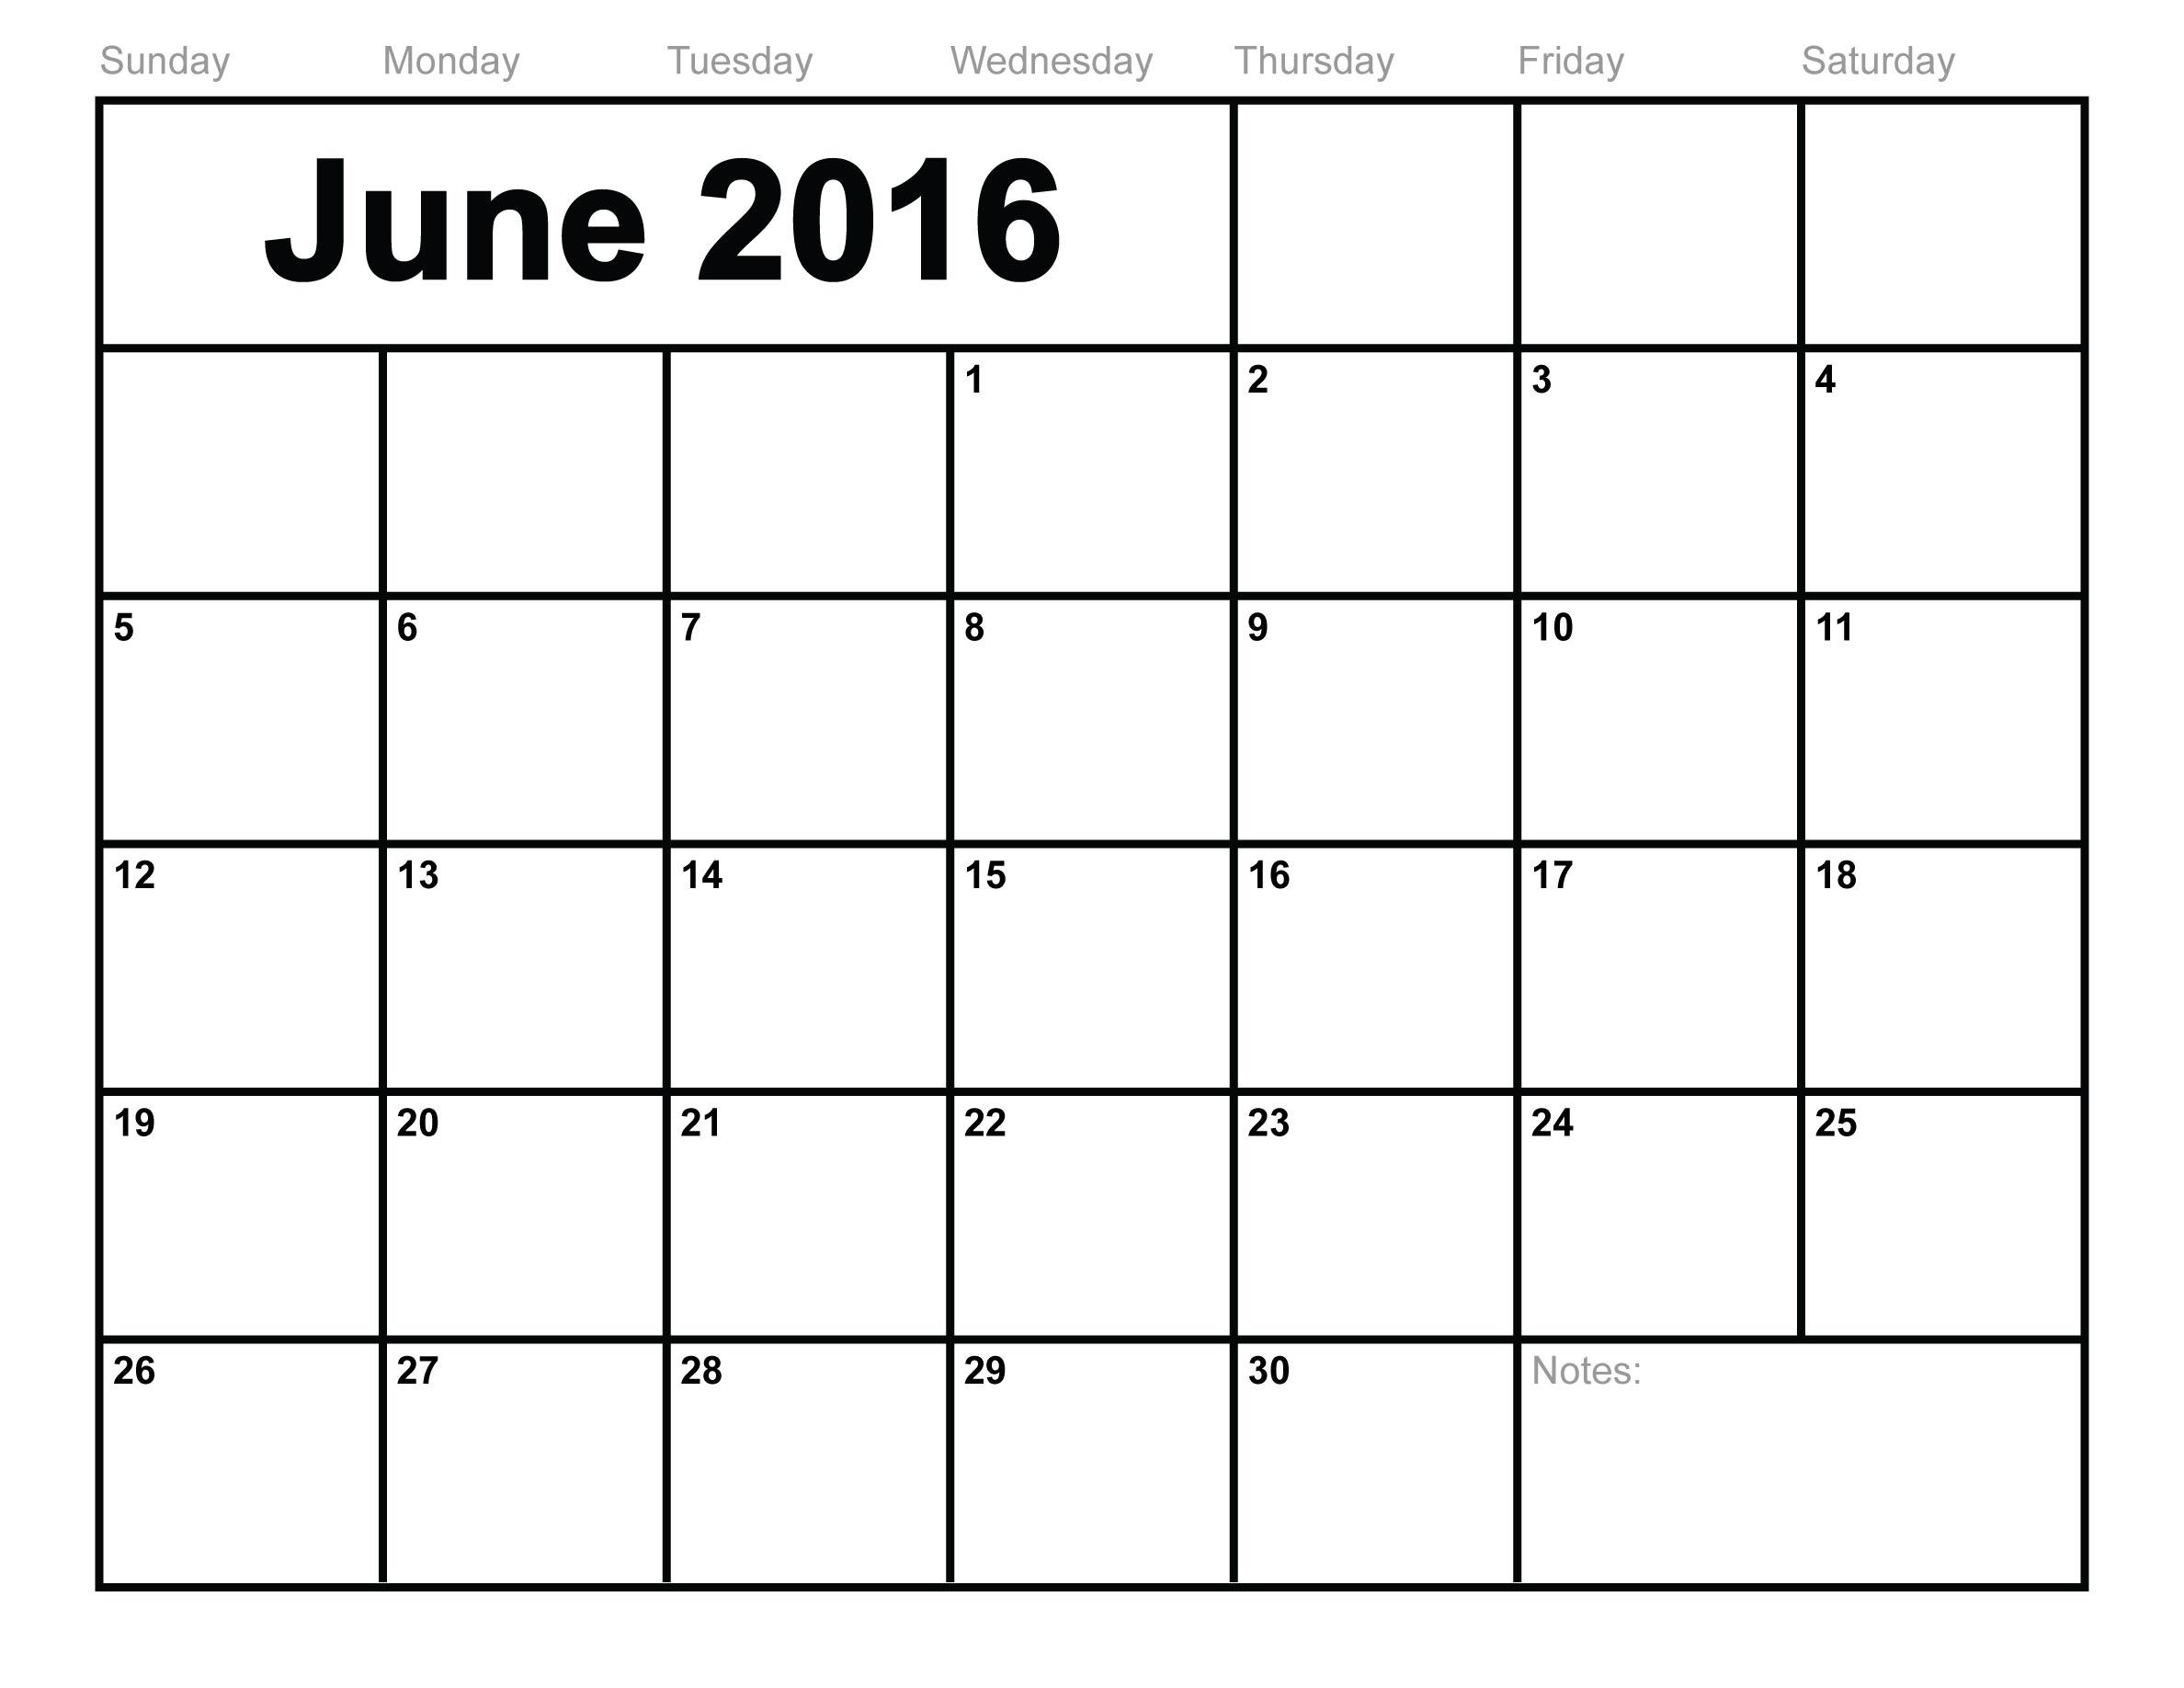 June 2016 calendar clipart banner freeuse library 2016 Calendar Printable banner freeuse library